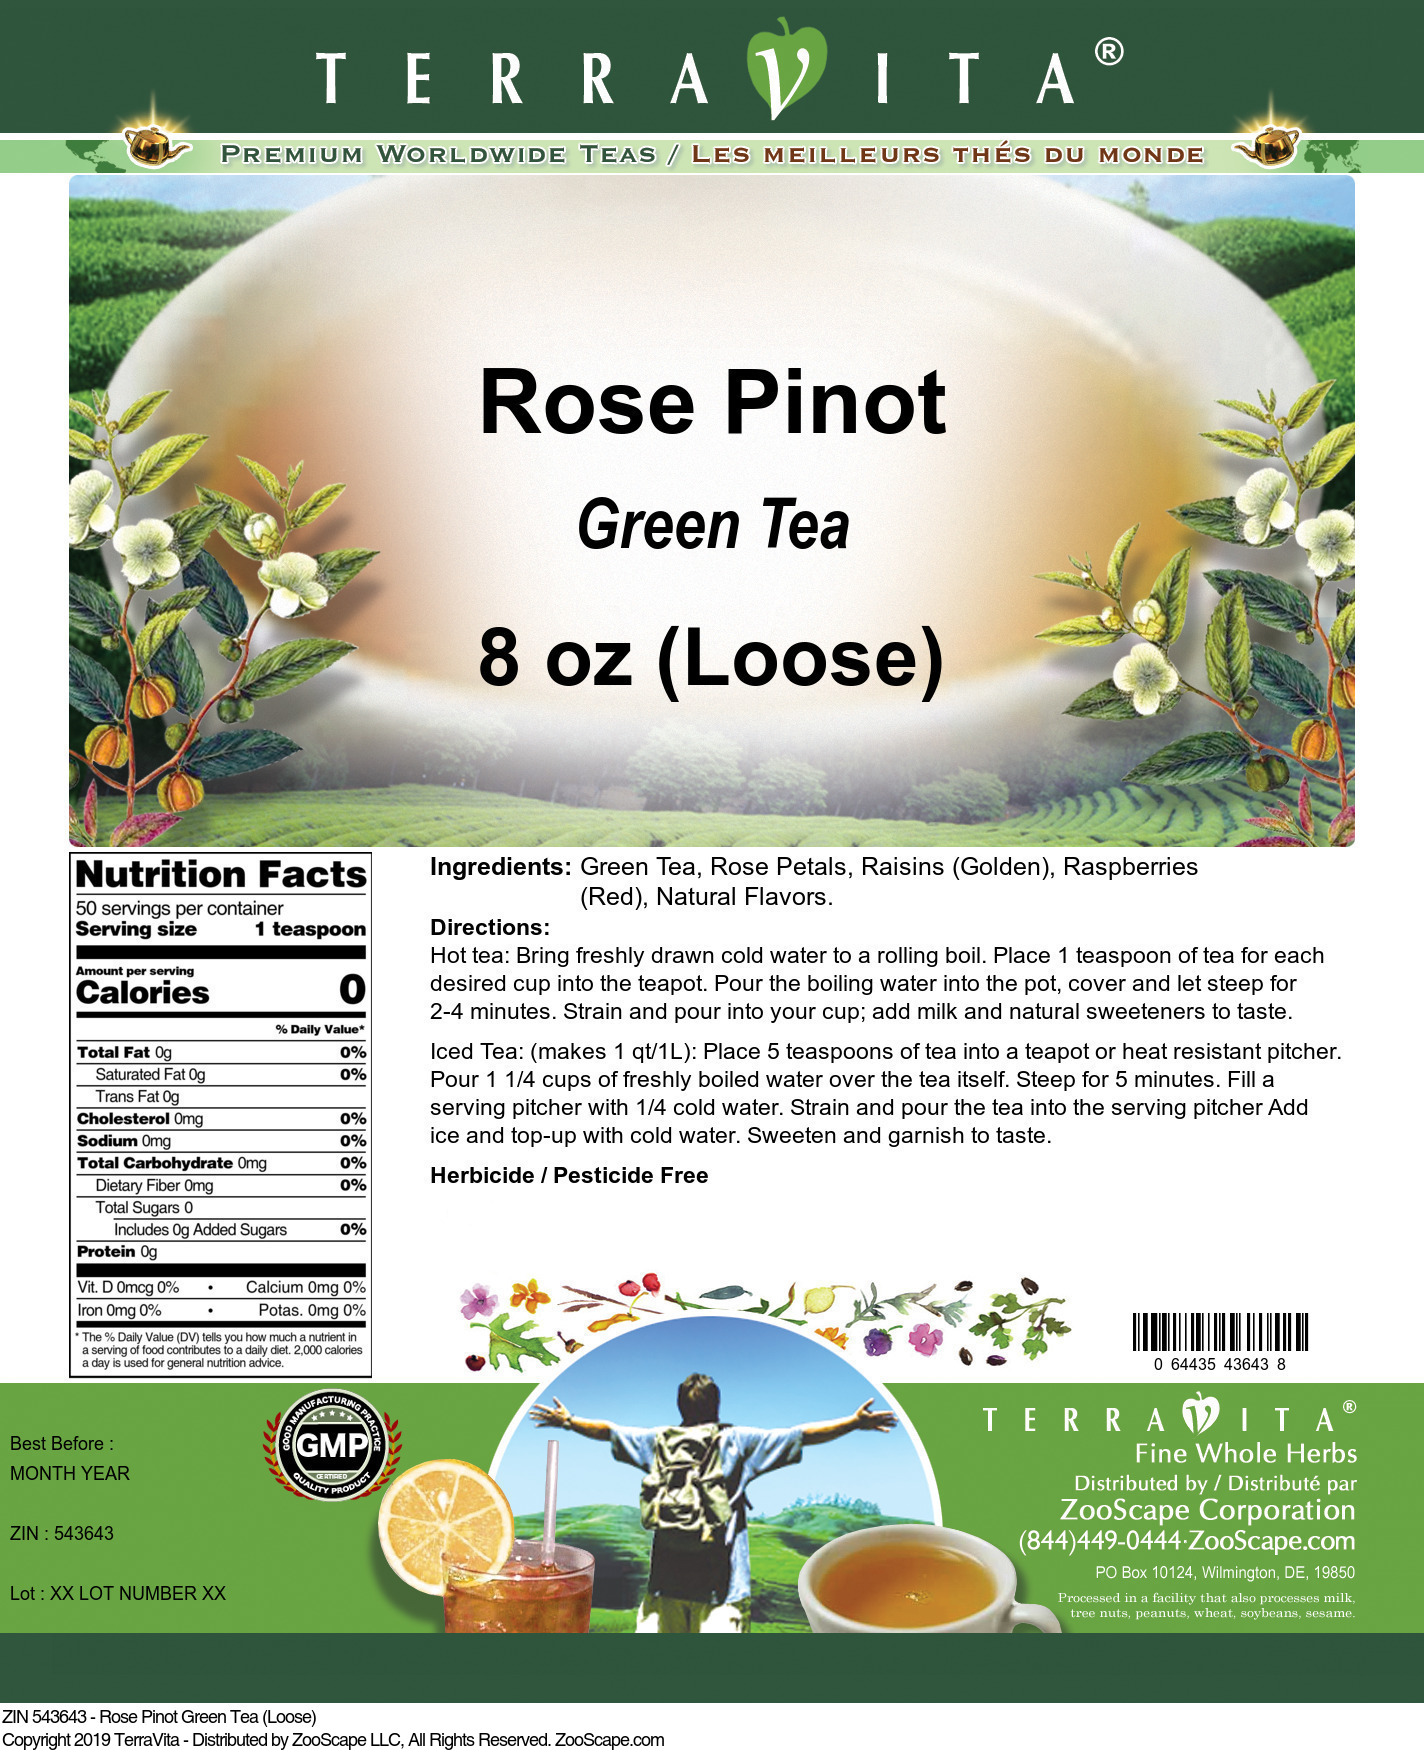 Rose Pinot Green Tea (Loose)